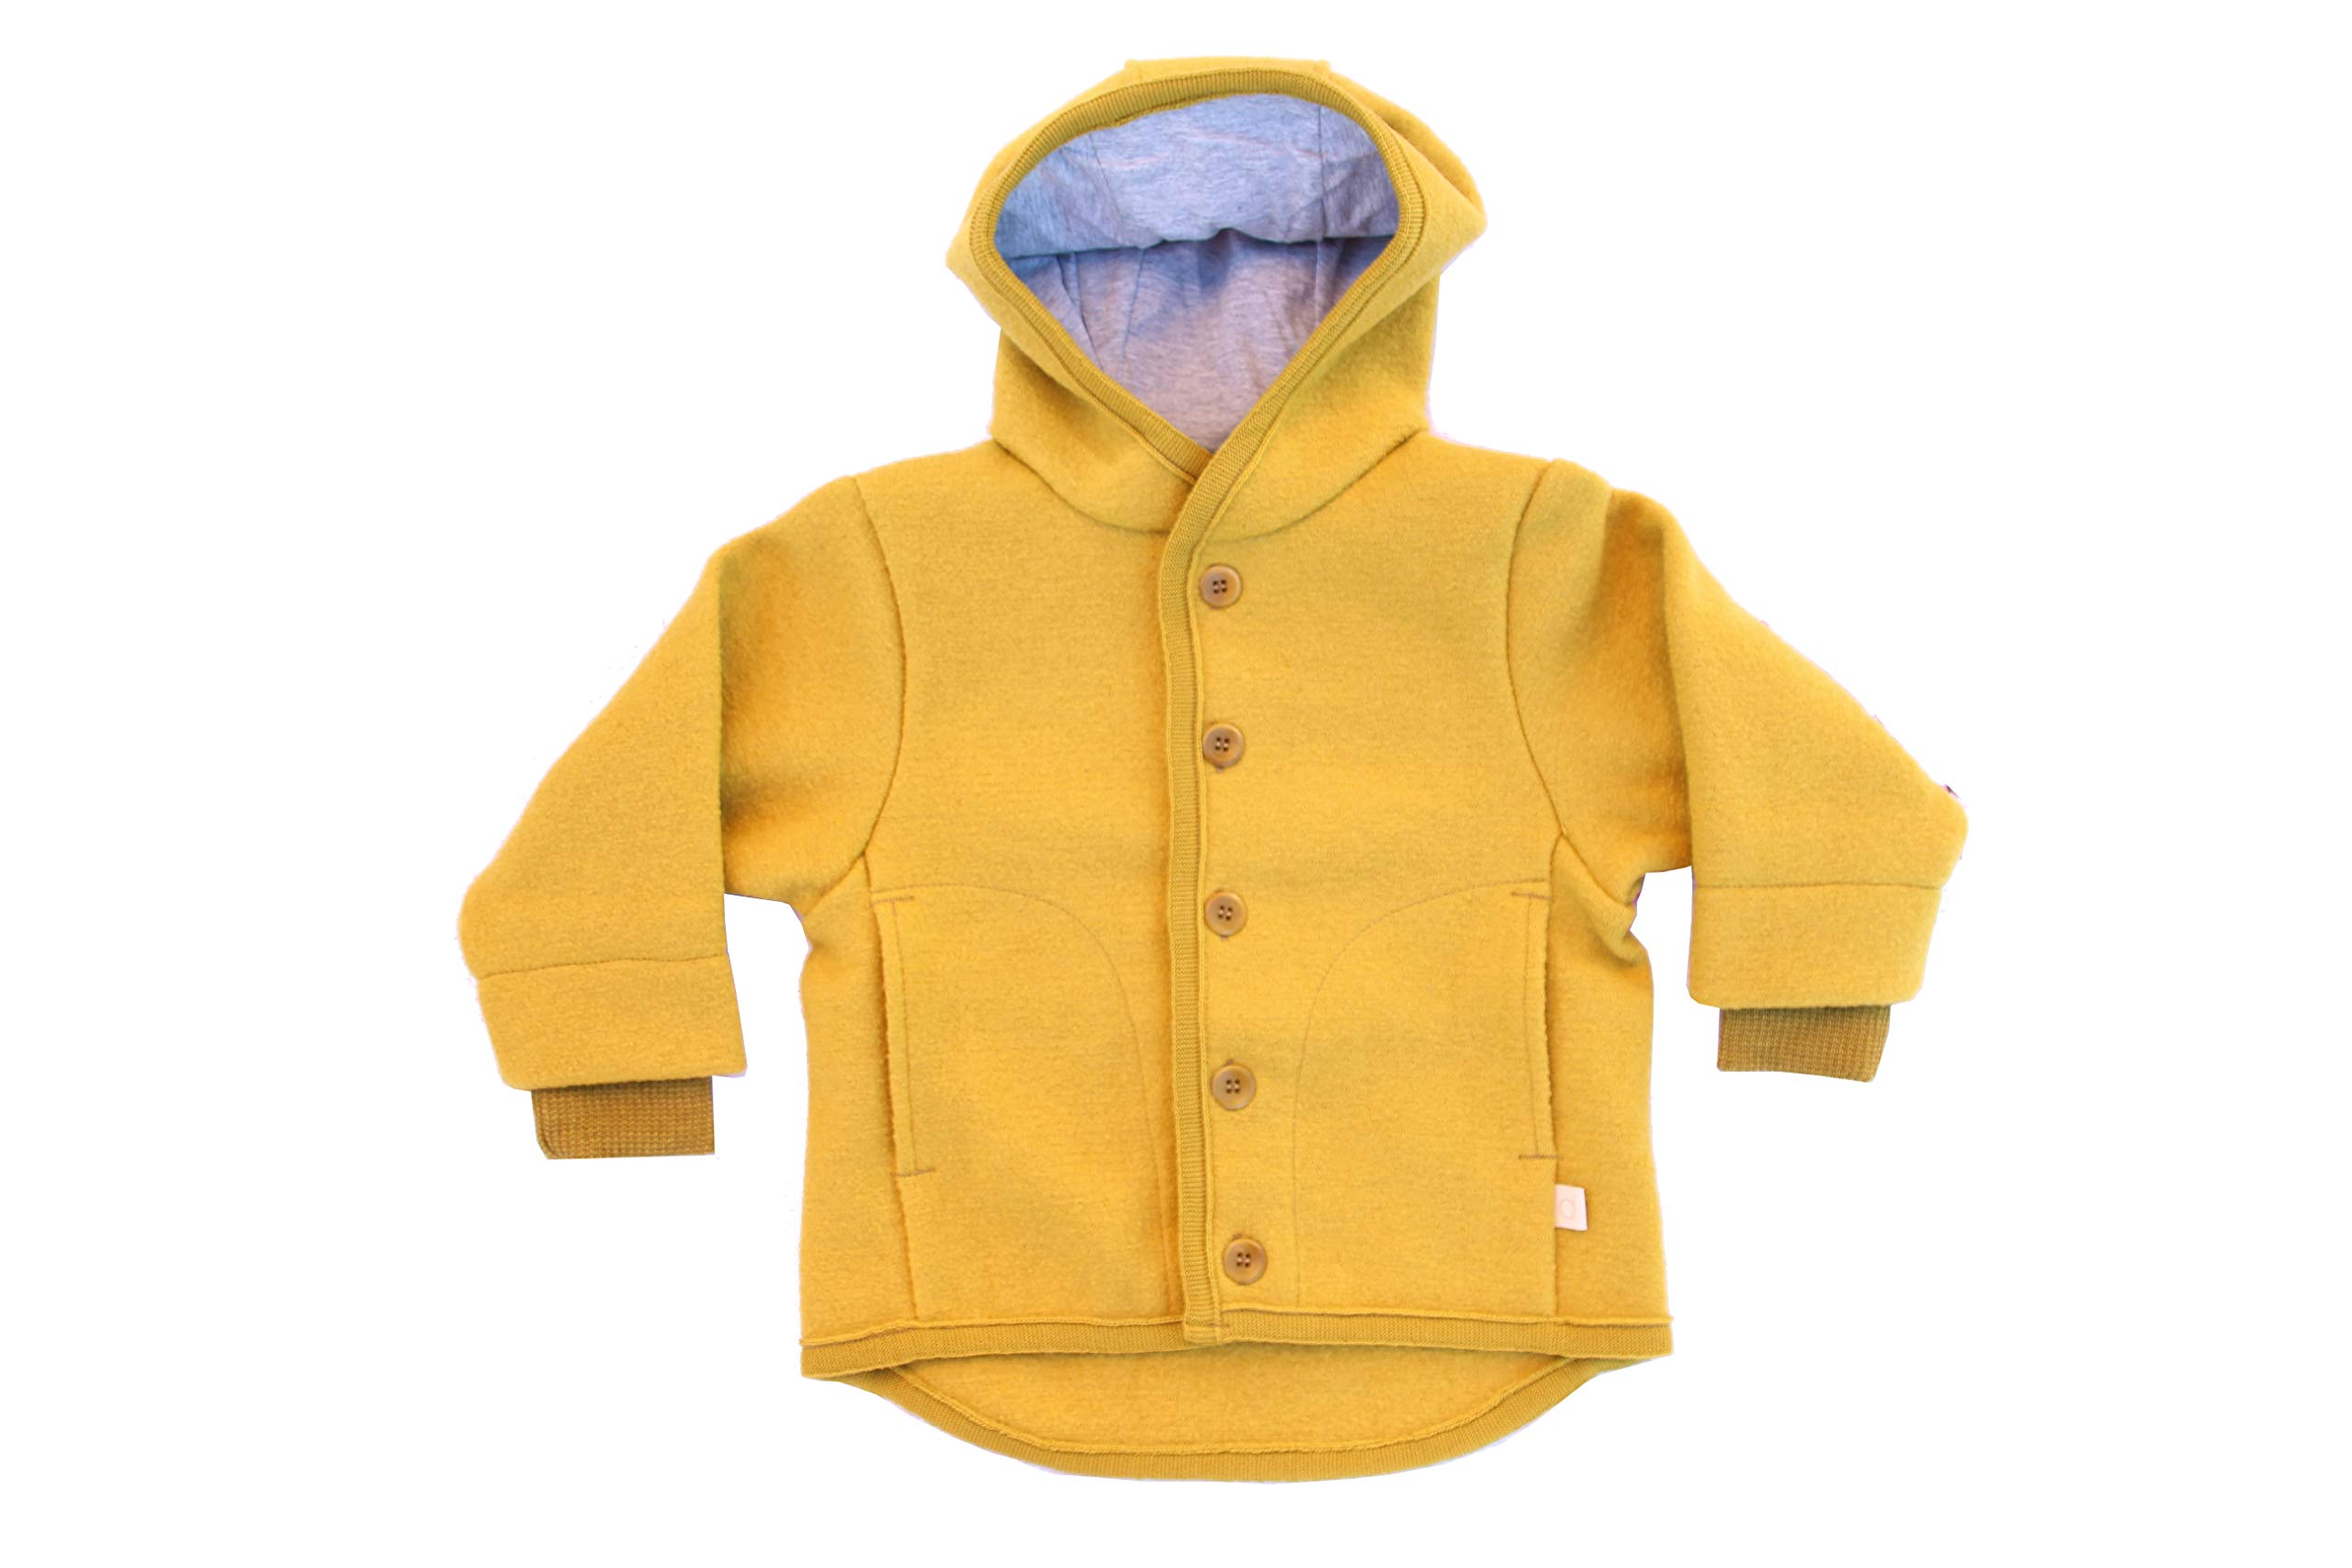 Disana Walk Chaqueta 3221 100% lana virgen, forro 100% algodón 1